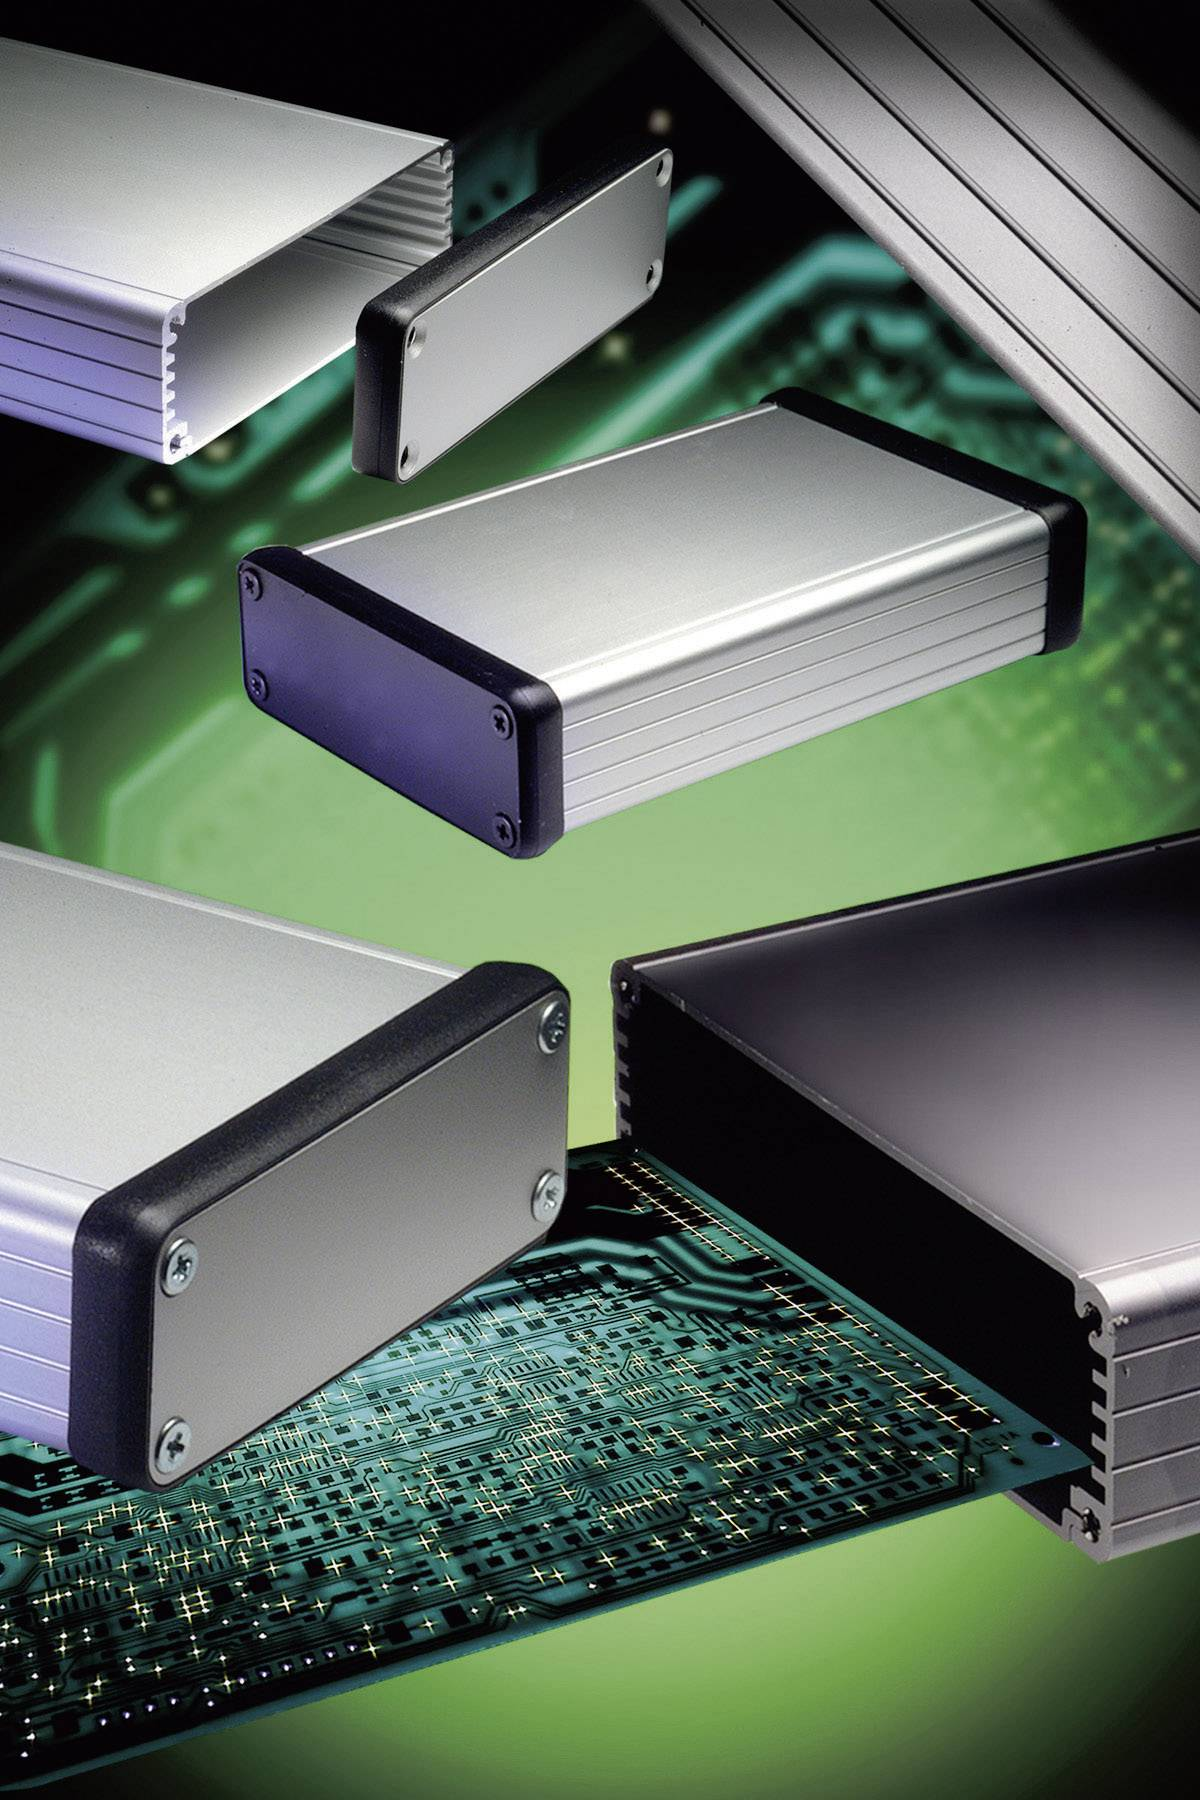 Profilové puzdro Hammond Electronics 1455C802BK 1455C802BK, 80 x 54 x 23 , hliník, čierna, 1 ks